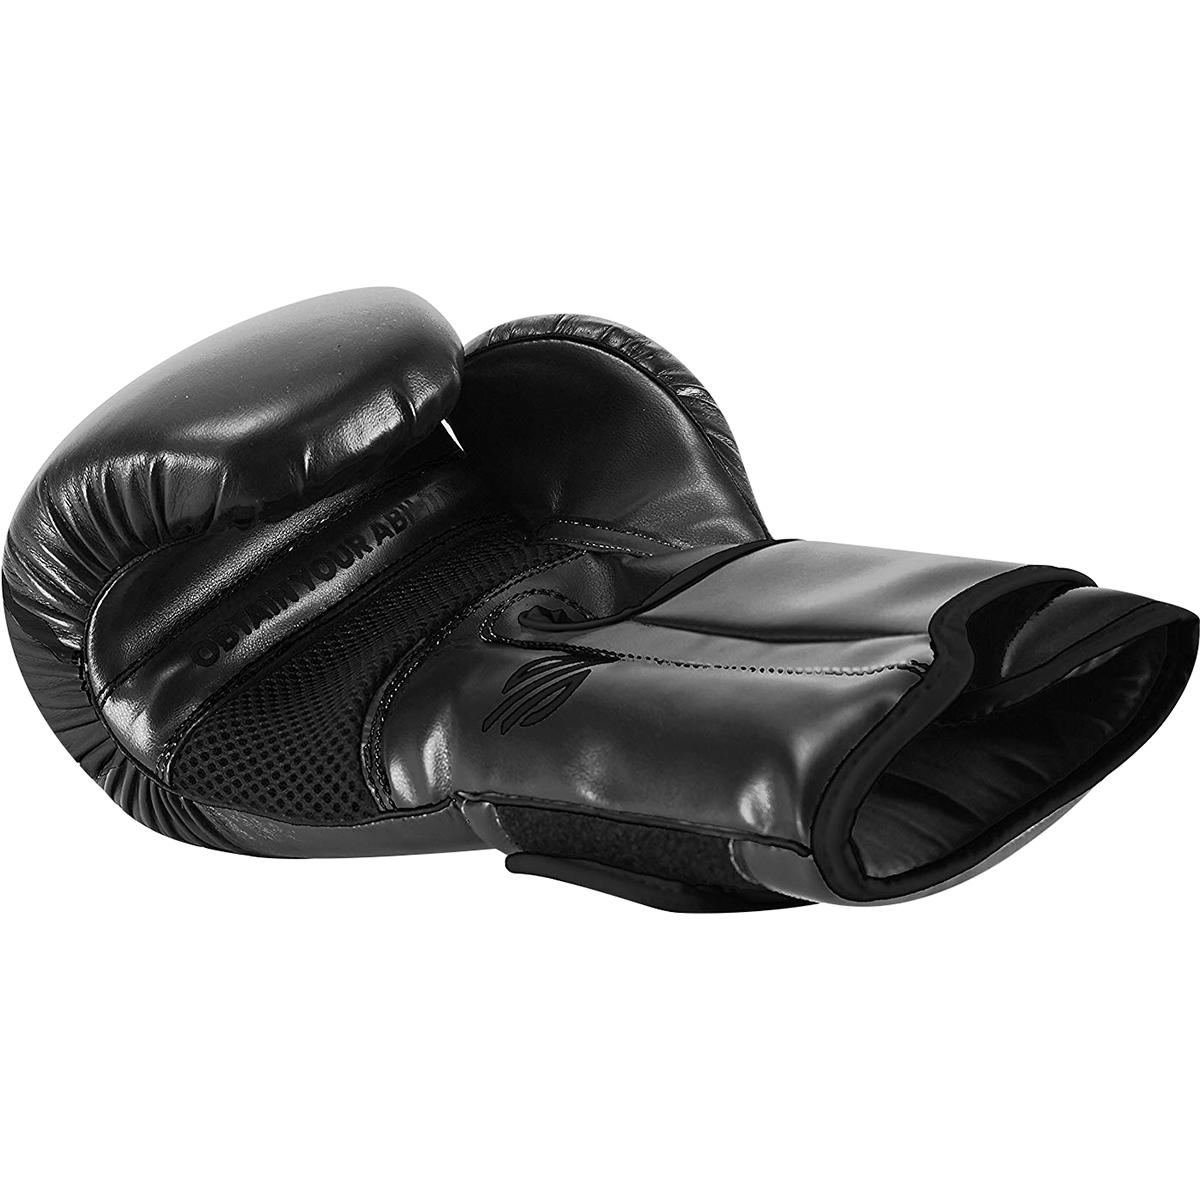 thumbnail 4 - Sanabul Essential Gel Training Boxing Gloves